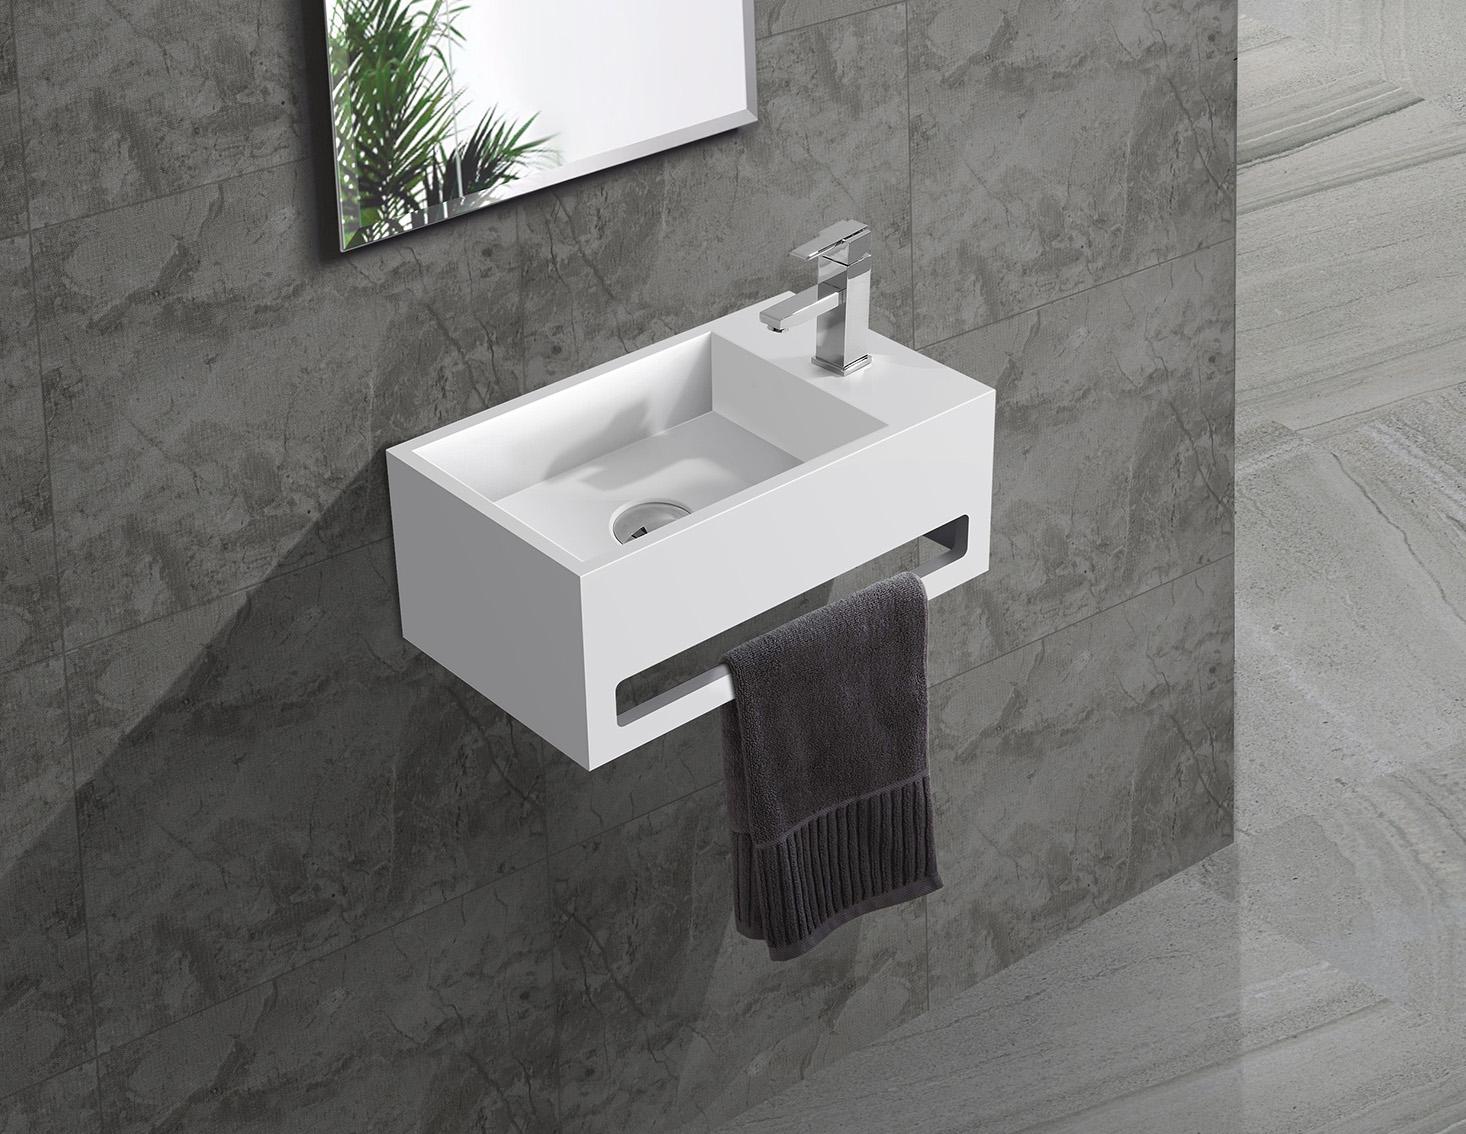 KingKonree stainless steel wash basin design for hotel-1